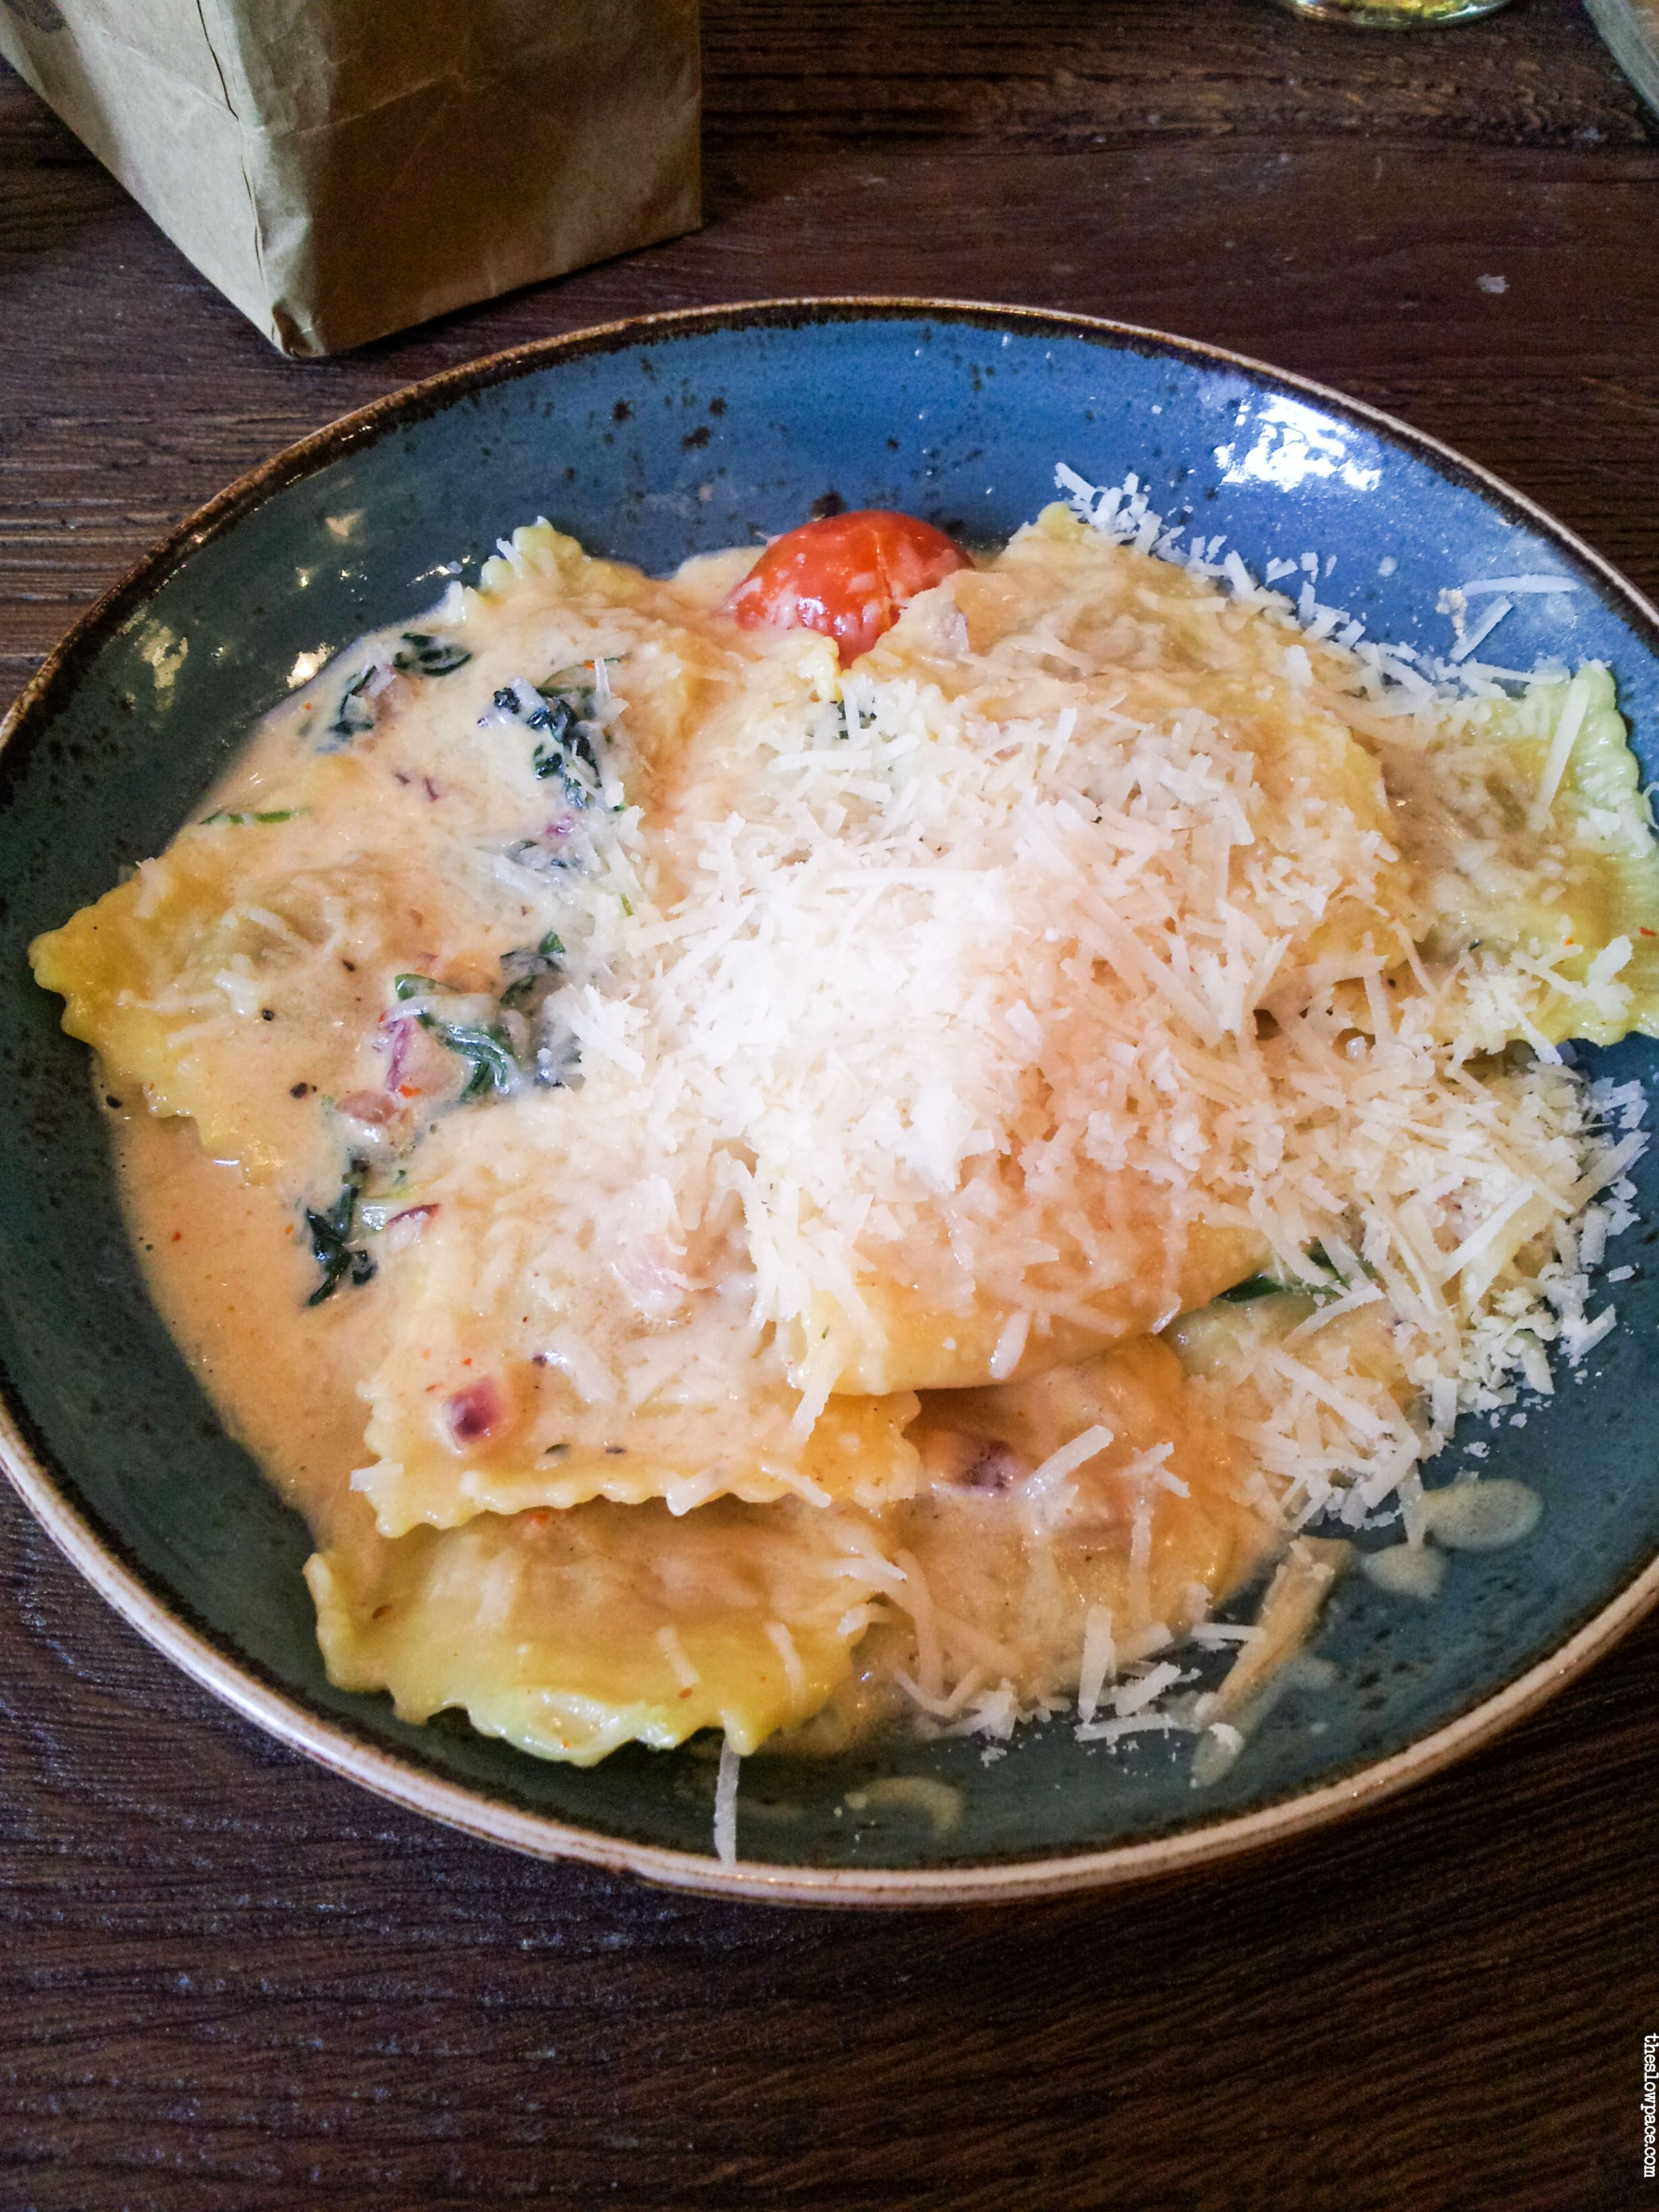 Loui jules bremen food photography reisen pinterest loui jules bremen food photography publicscrutiny Image collections